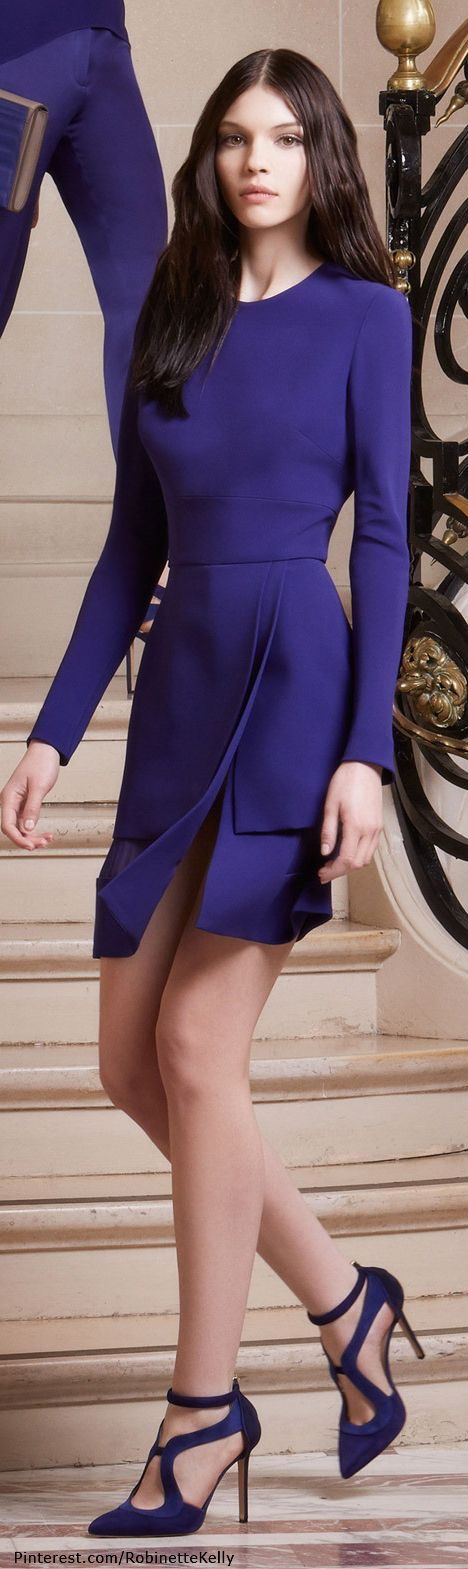 Elie Saab | vestido e sapato